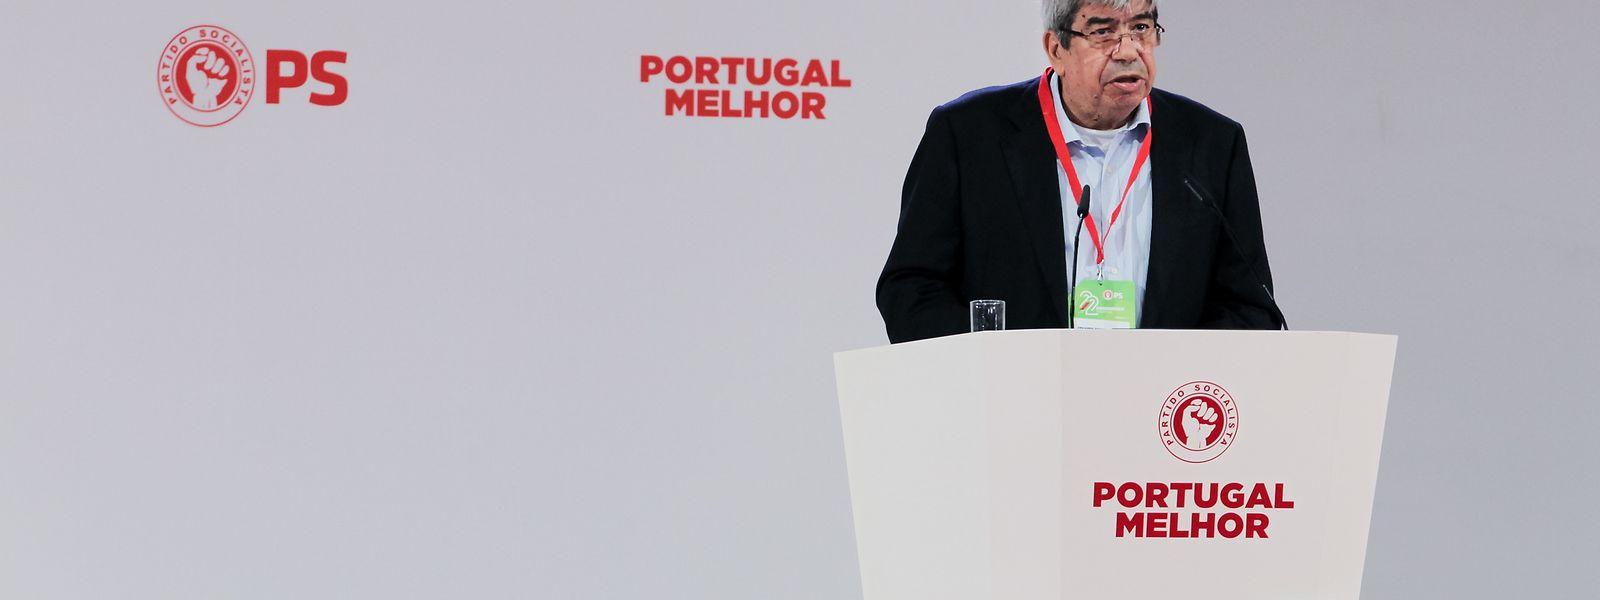 Ferro Rodrigues, intervém durante o segundo dia do 22º Congresso Nacional do Partido Socialista, Batalha, 26 de maio de 2018. PAULO CUNHA/LUSA